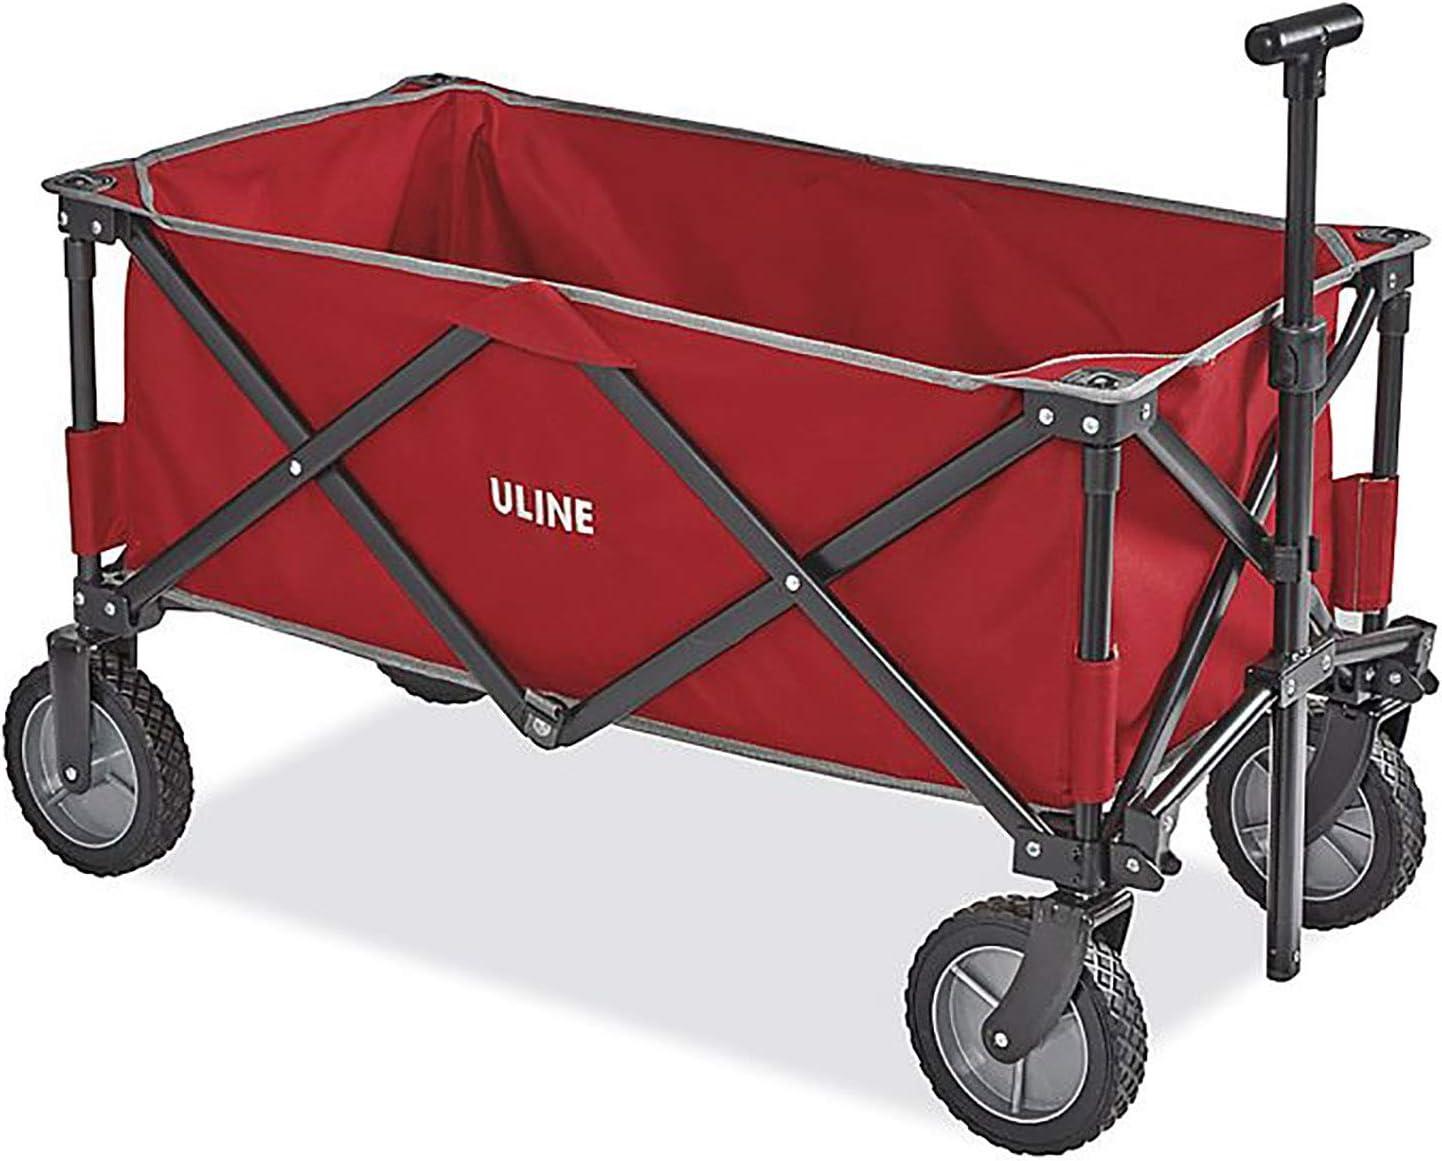 ULINE Utility Wagon, Red